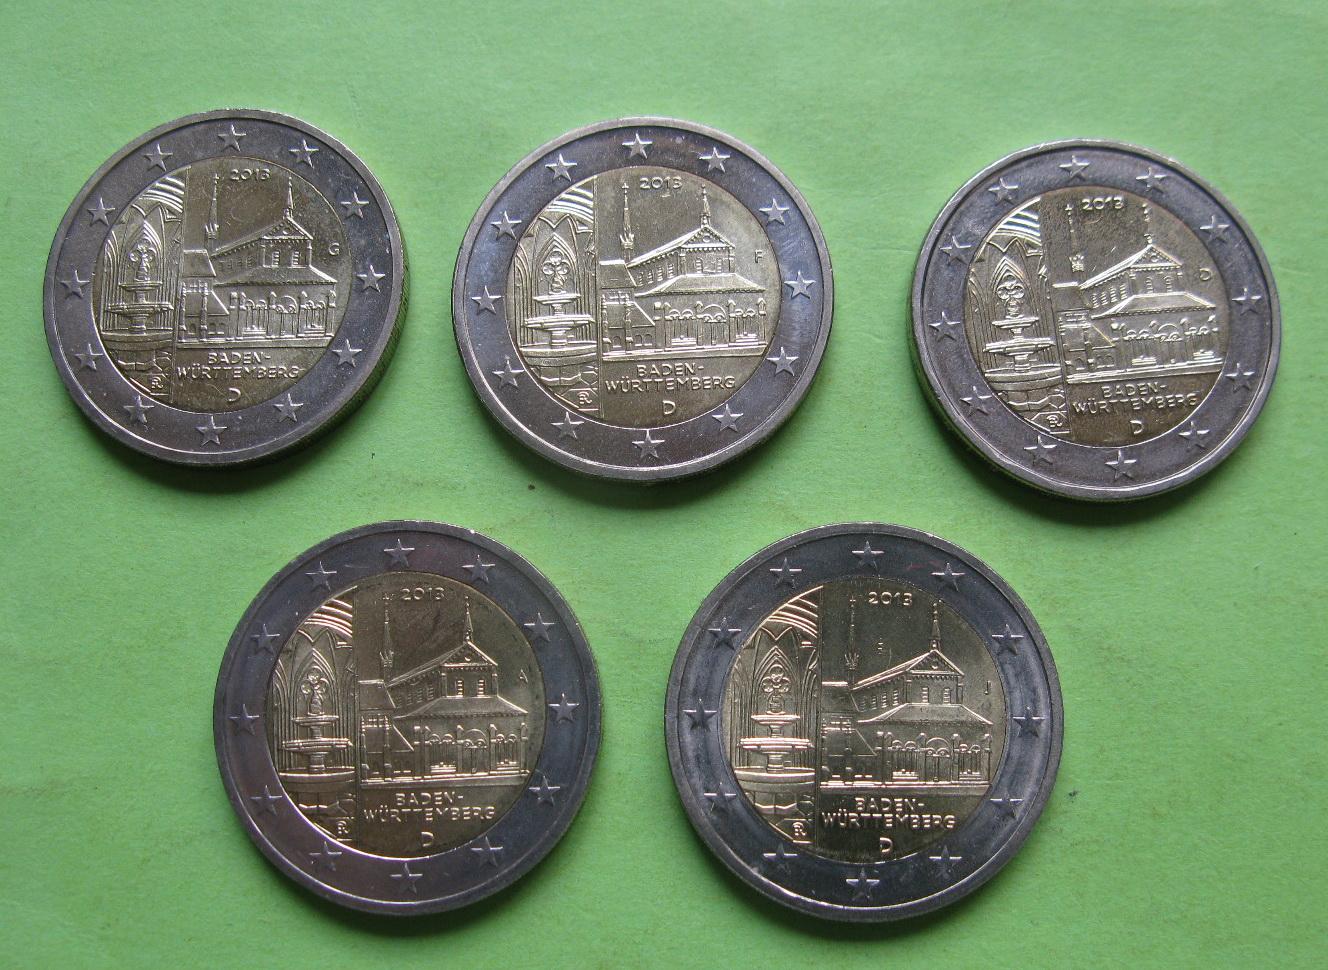 Германия 2 евро 2013 г. Баден-Вюртемберг ( A,D,F,G,J)